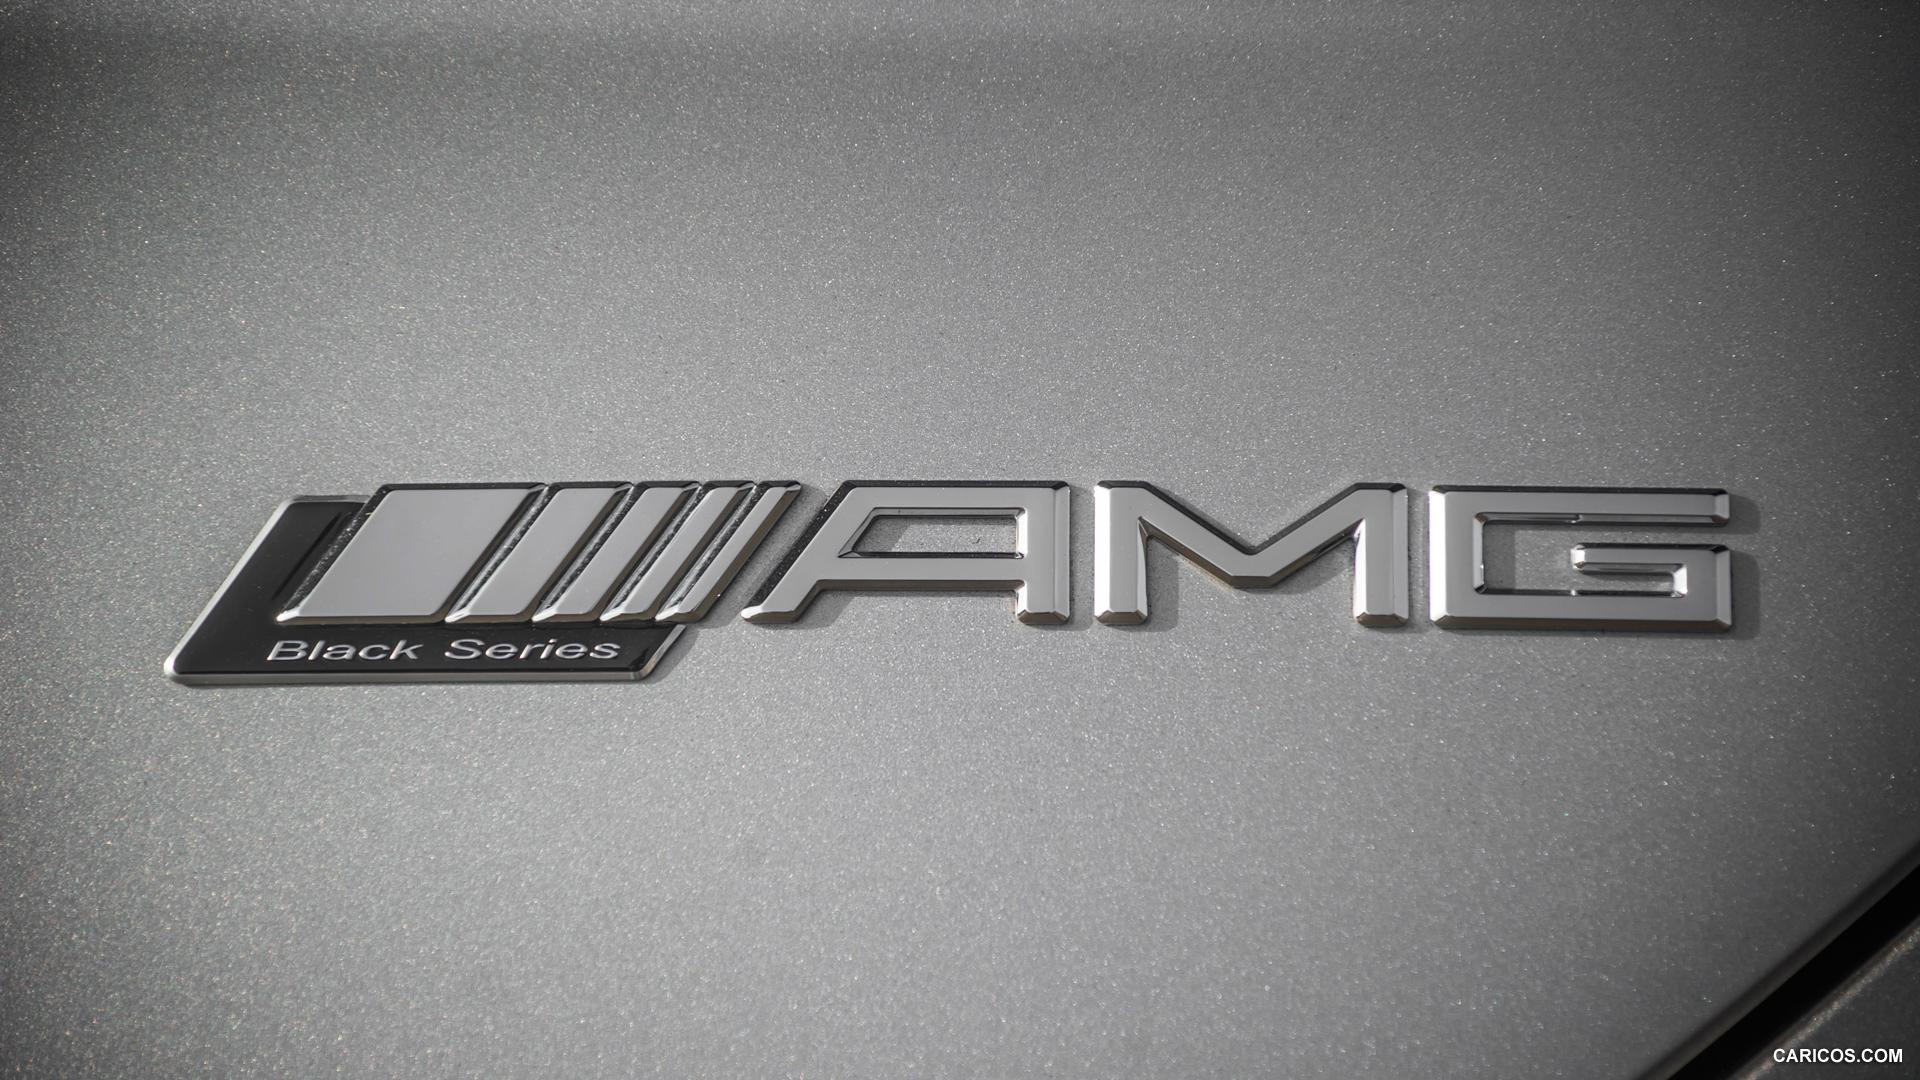 AMG Logo Wallpaper 1920x1080